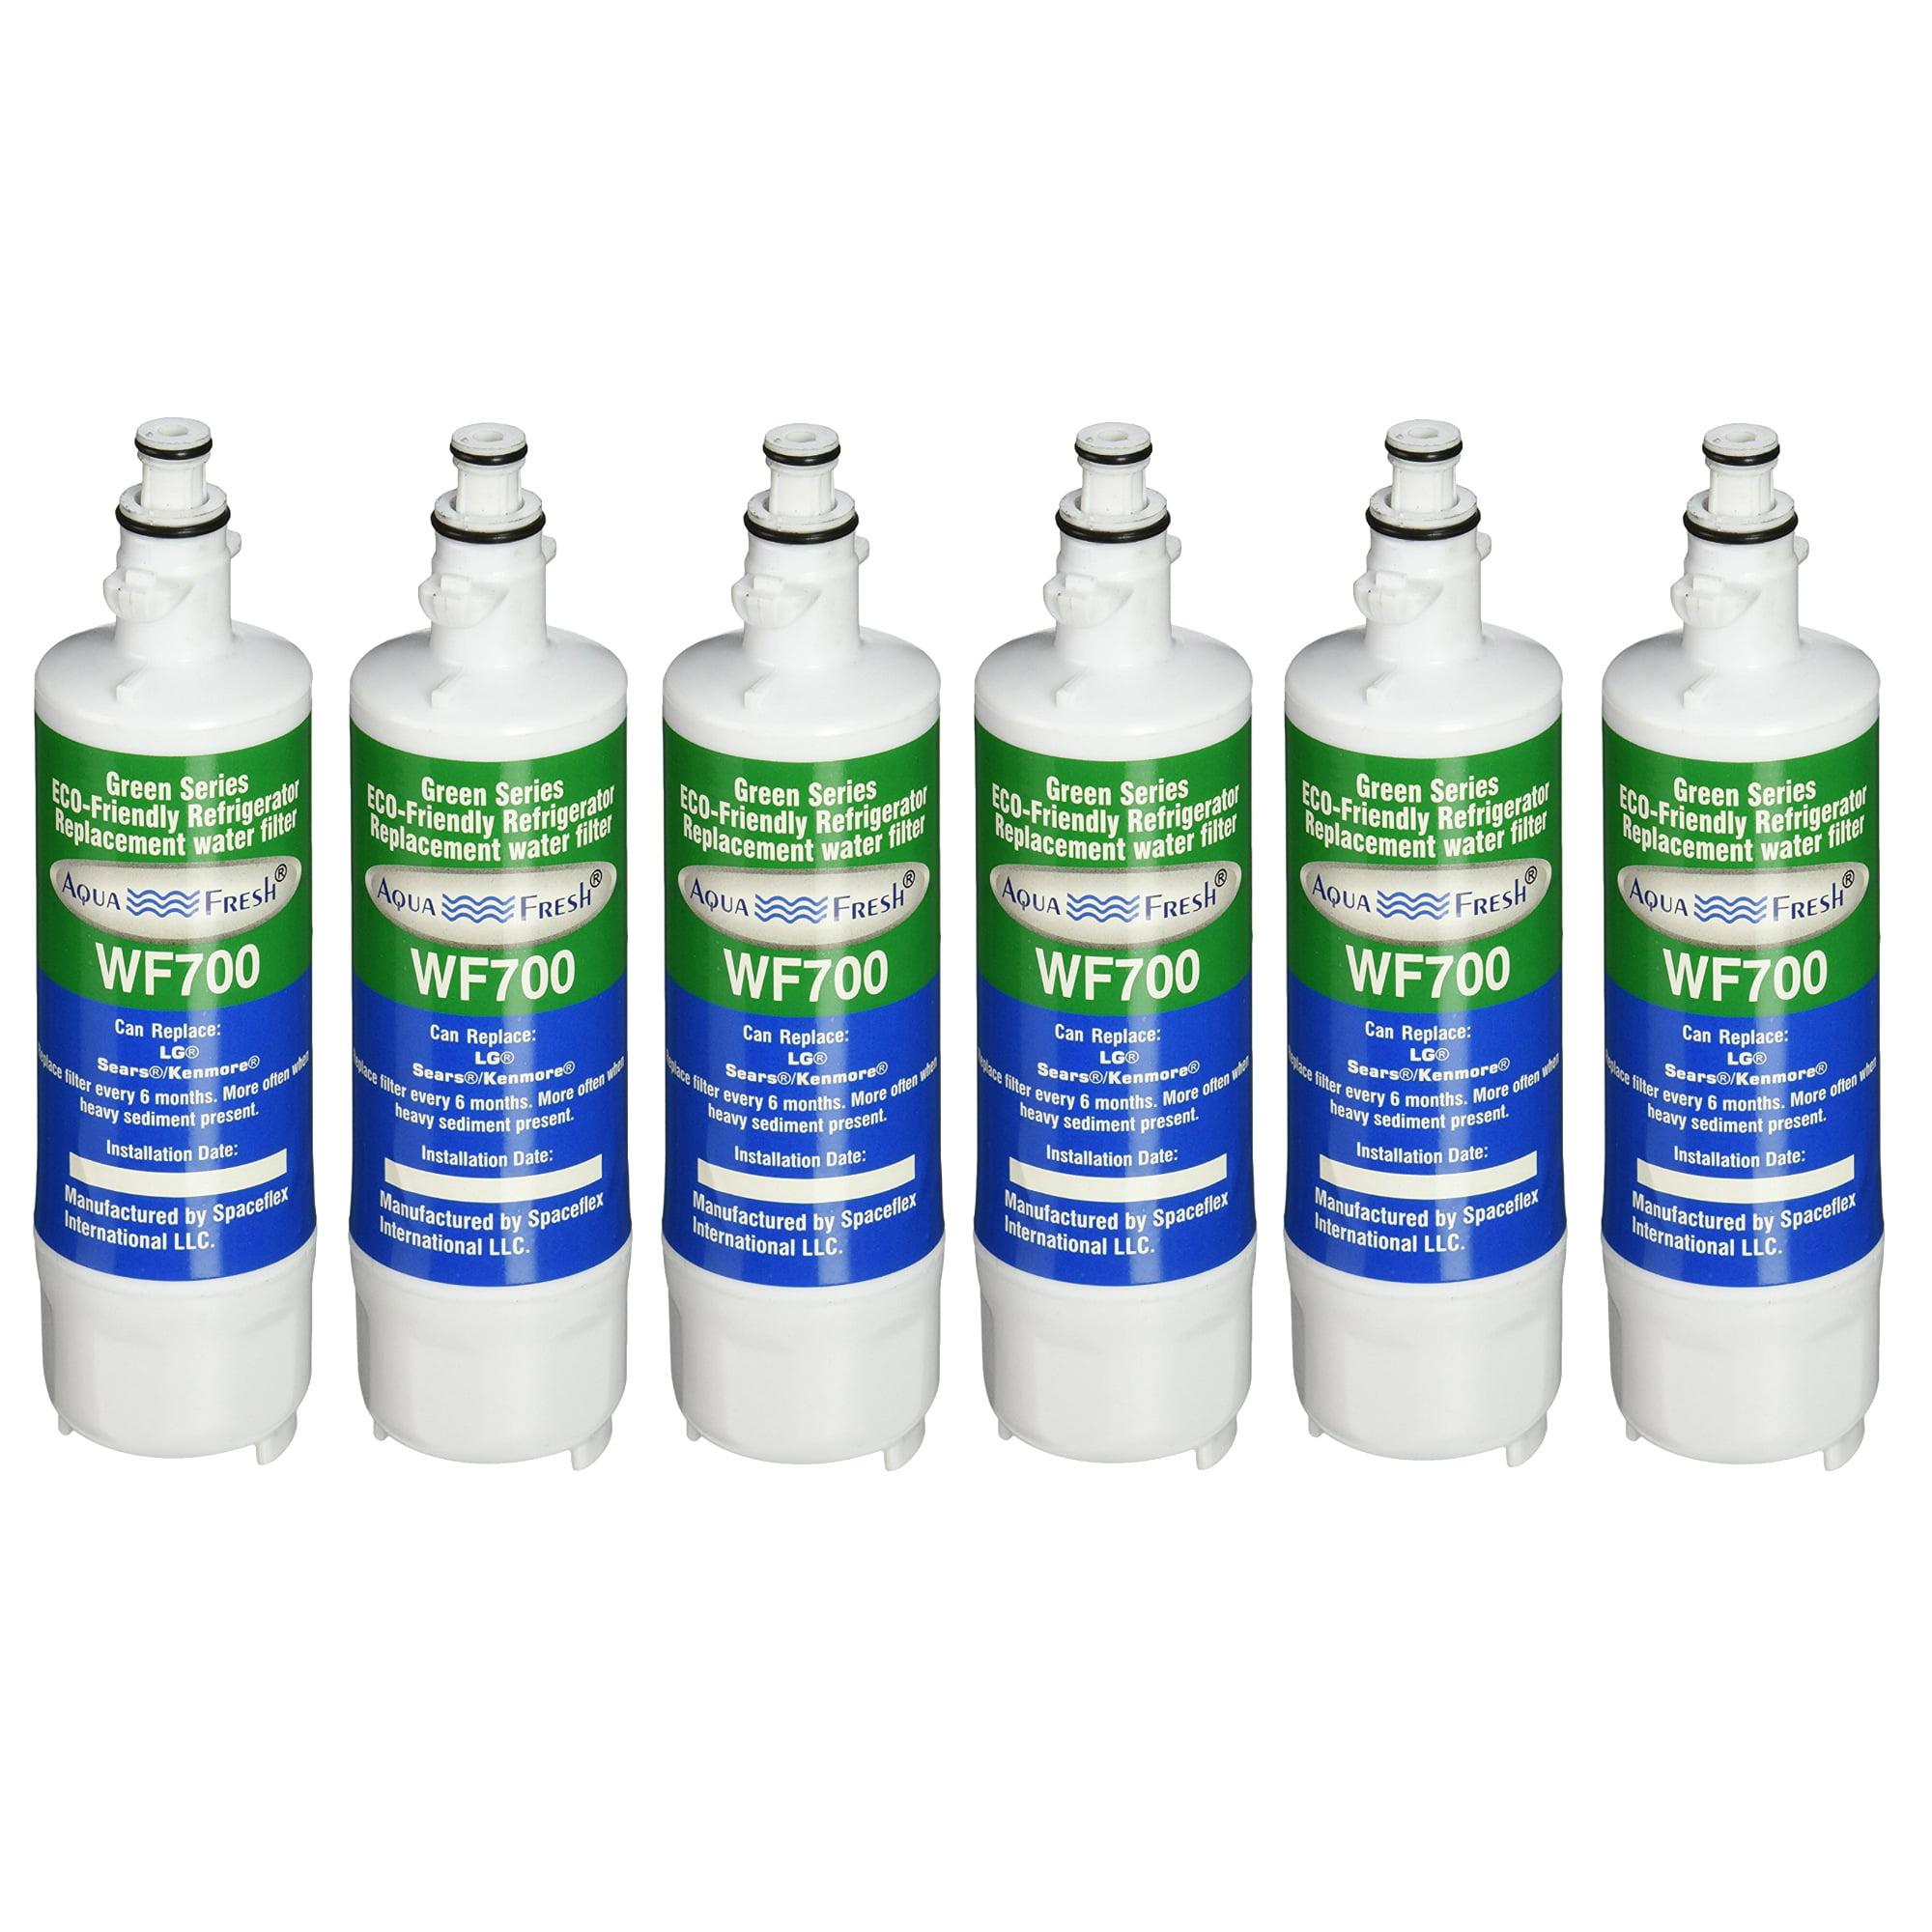 Replacement Aqua Fresh LT700P Replacement Water Filter For LG & Kenmore Refrigerators (6 Pack)